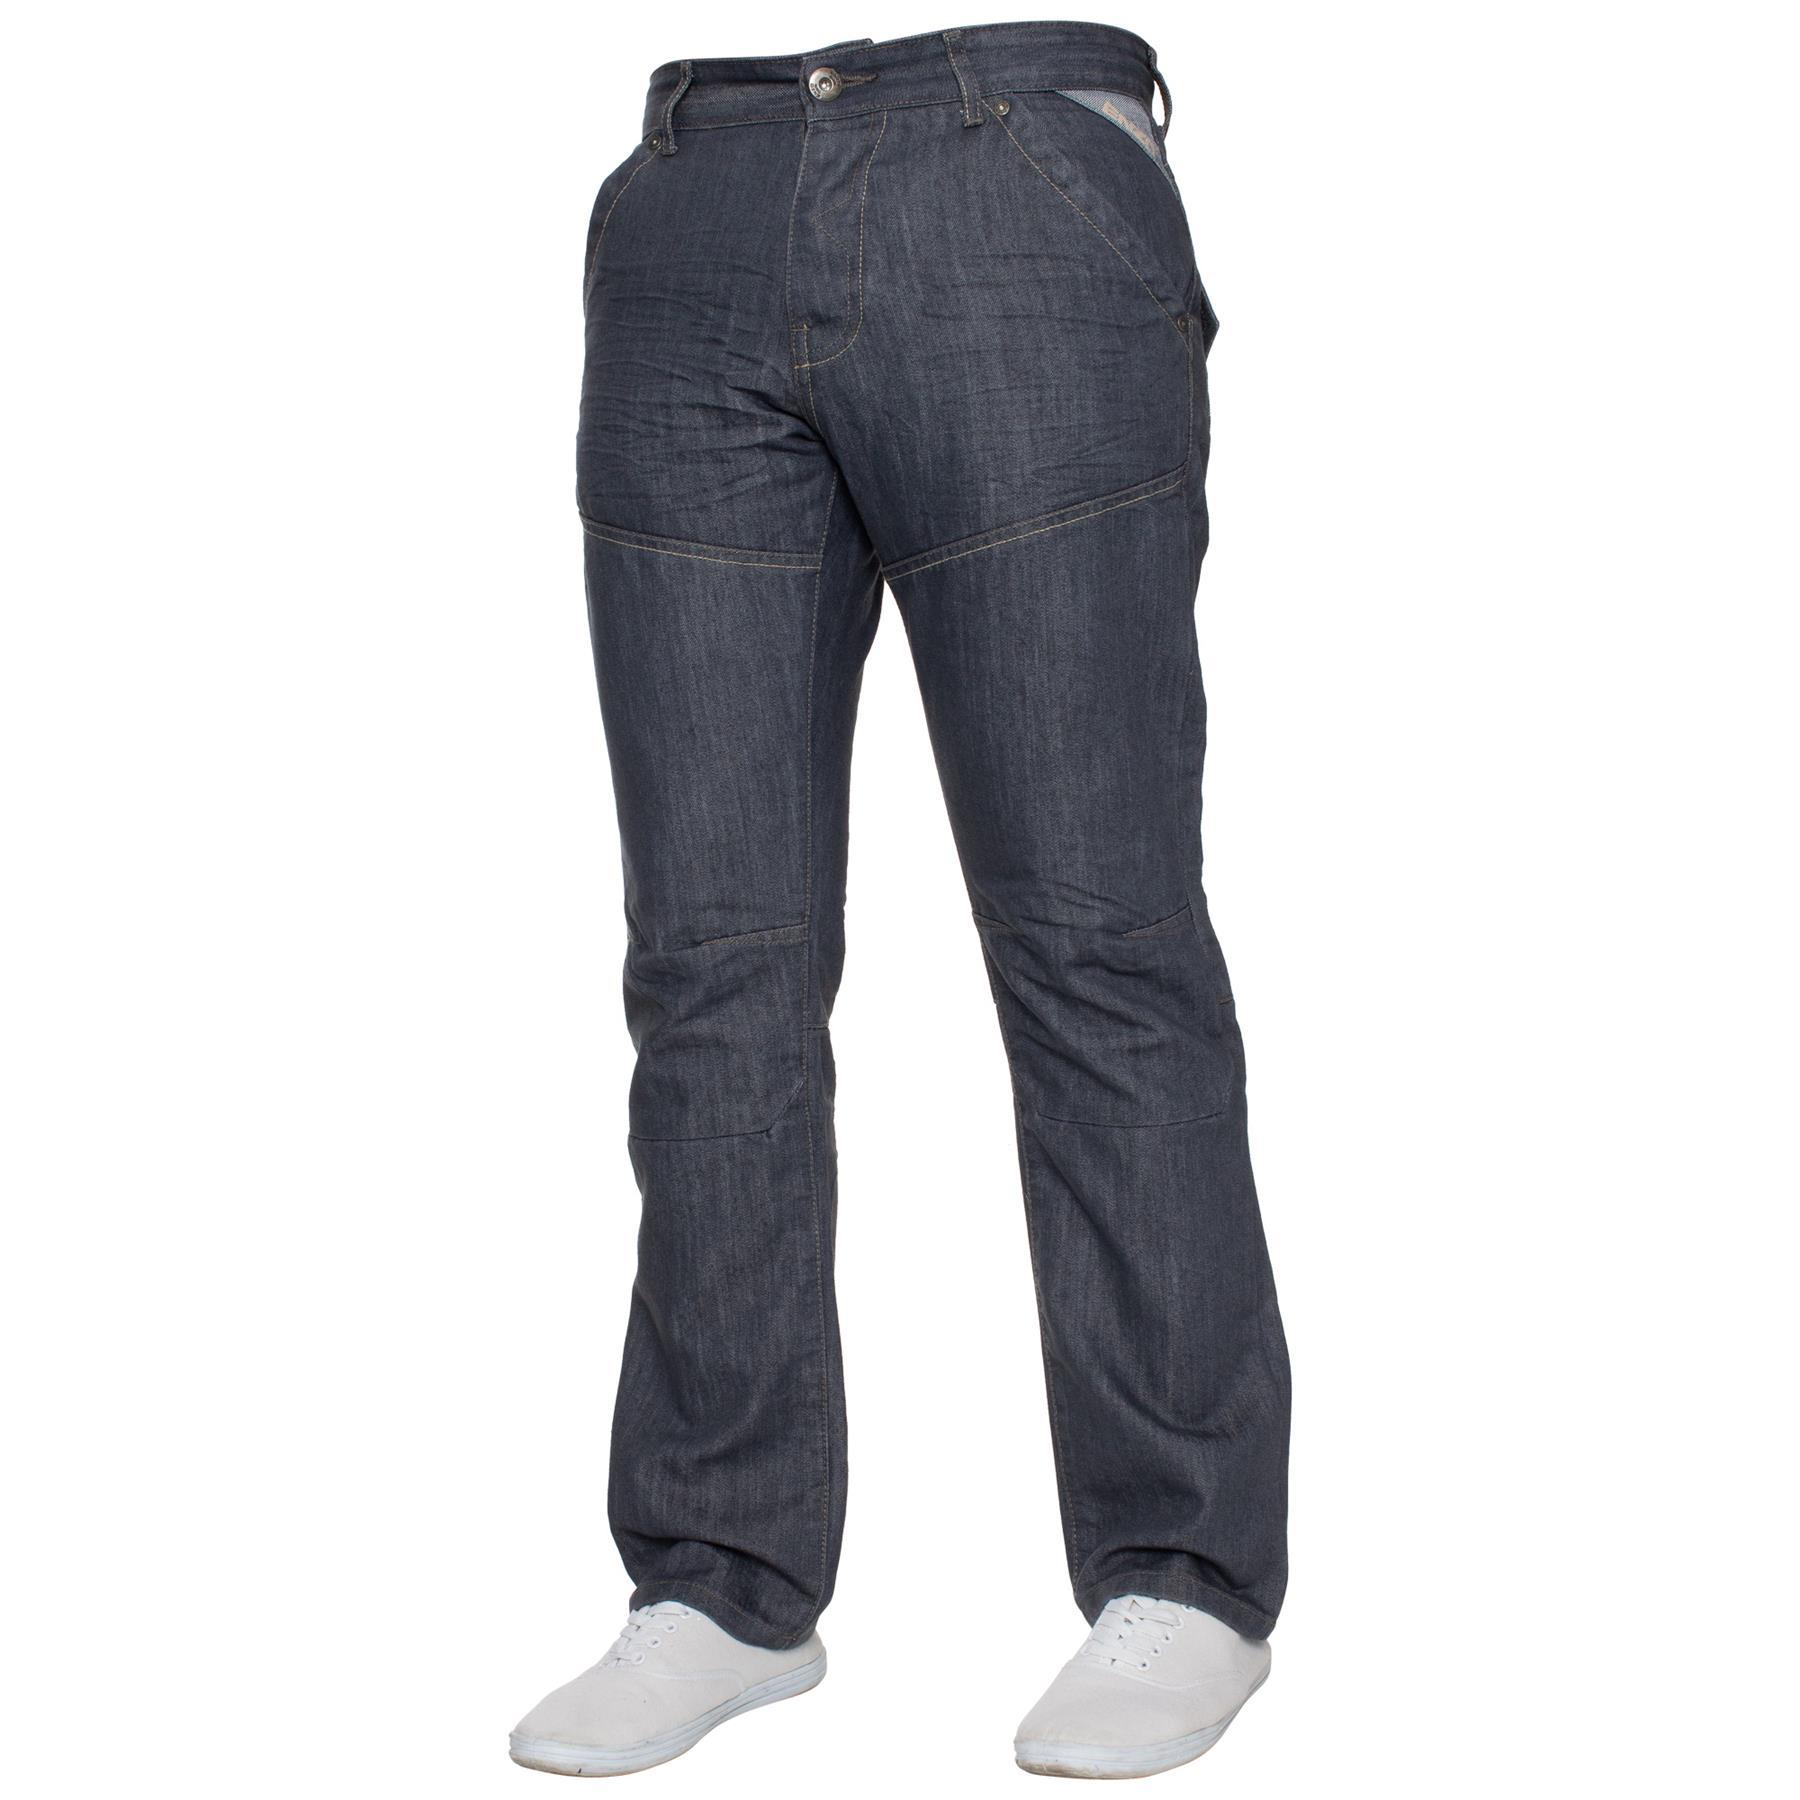 ENZO-Jeans-para-hombre-Big-Alto-Pierna-King-Size-Jeans-Pantalones-Chino-Pantalones-Pantalones-44-034 miniatura 76